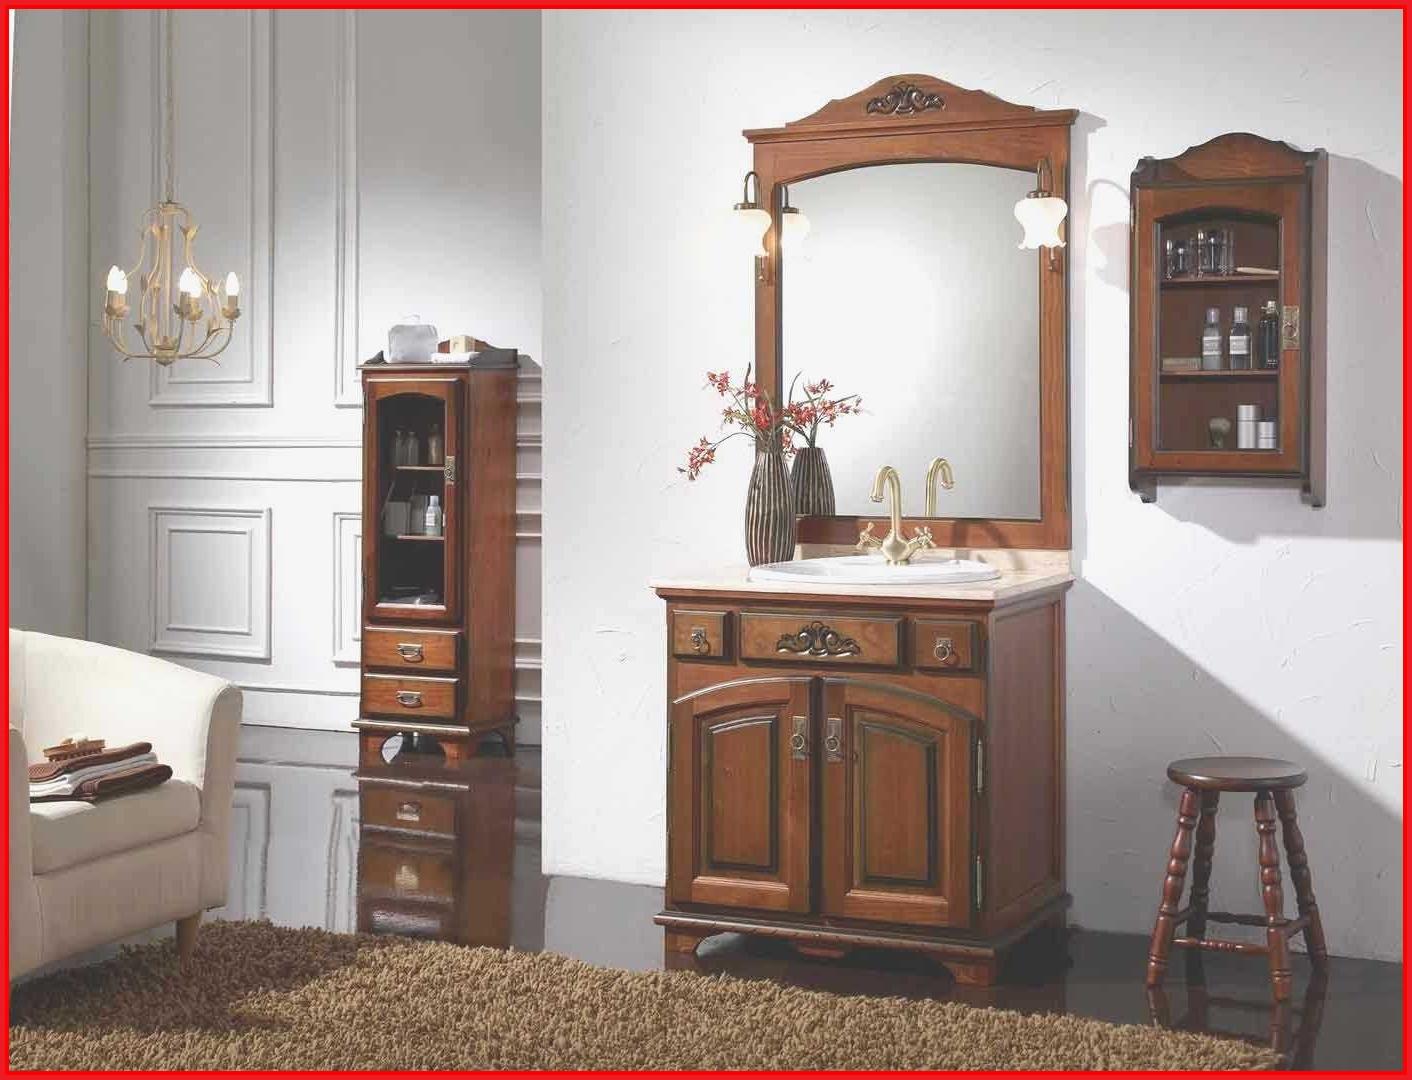 Muebles De Baño Blanco Qwdq Muebles Baà O Blanco Muebles De BaO Madera Muebles De BaO